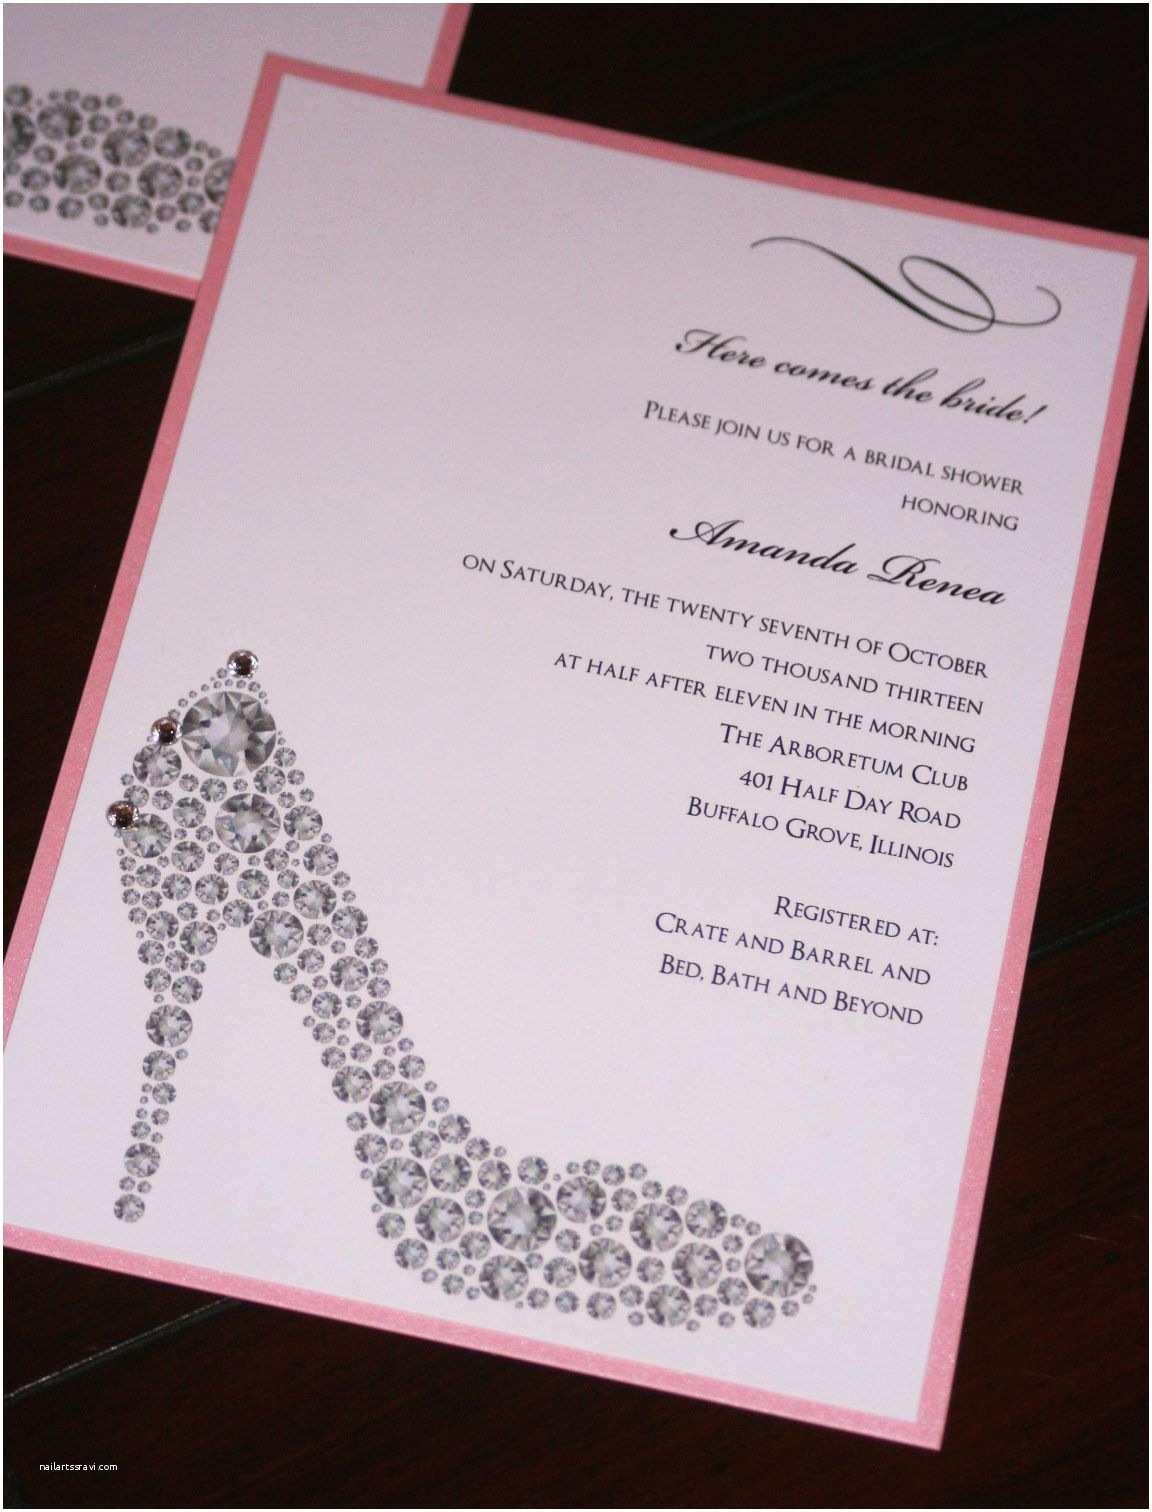 Invitations for Bridal Shower Diy Wedding Shower Invitations Diy Bridal Shower